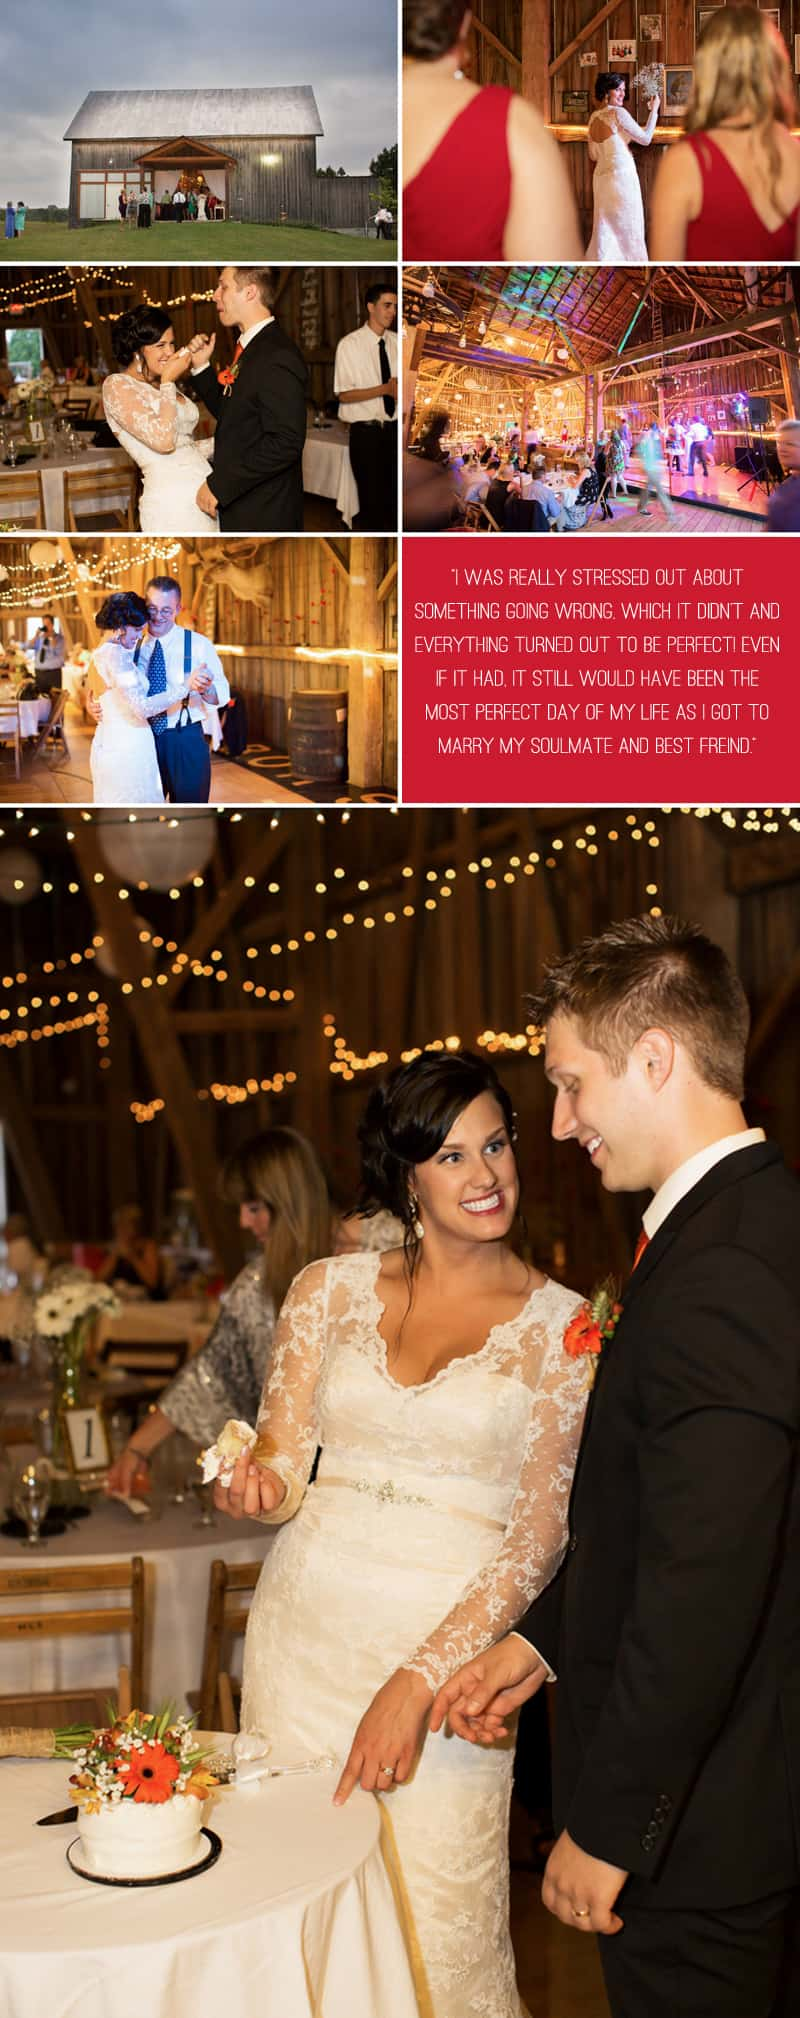 A Romantic Fall Wedding in a Rustic Barn 8